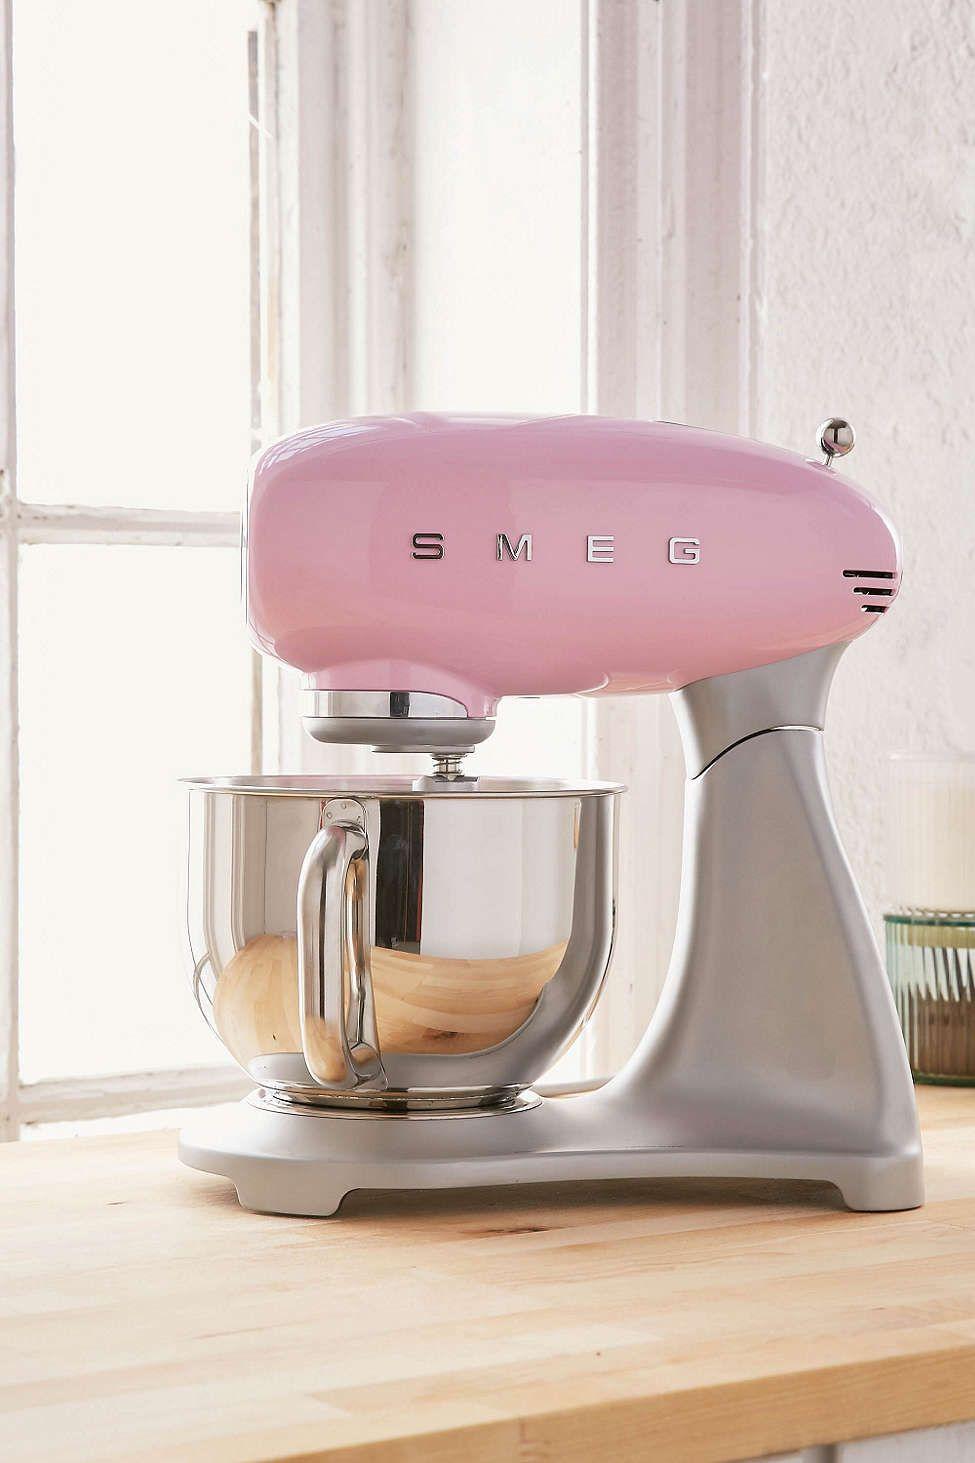 Smeg standing mixer smeg kitchen accessories stainless